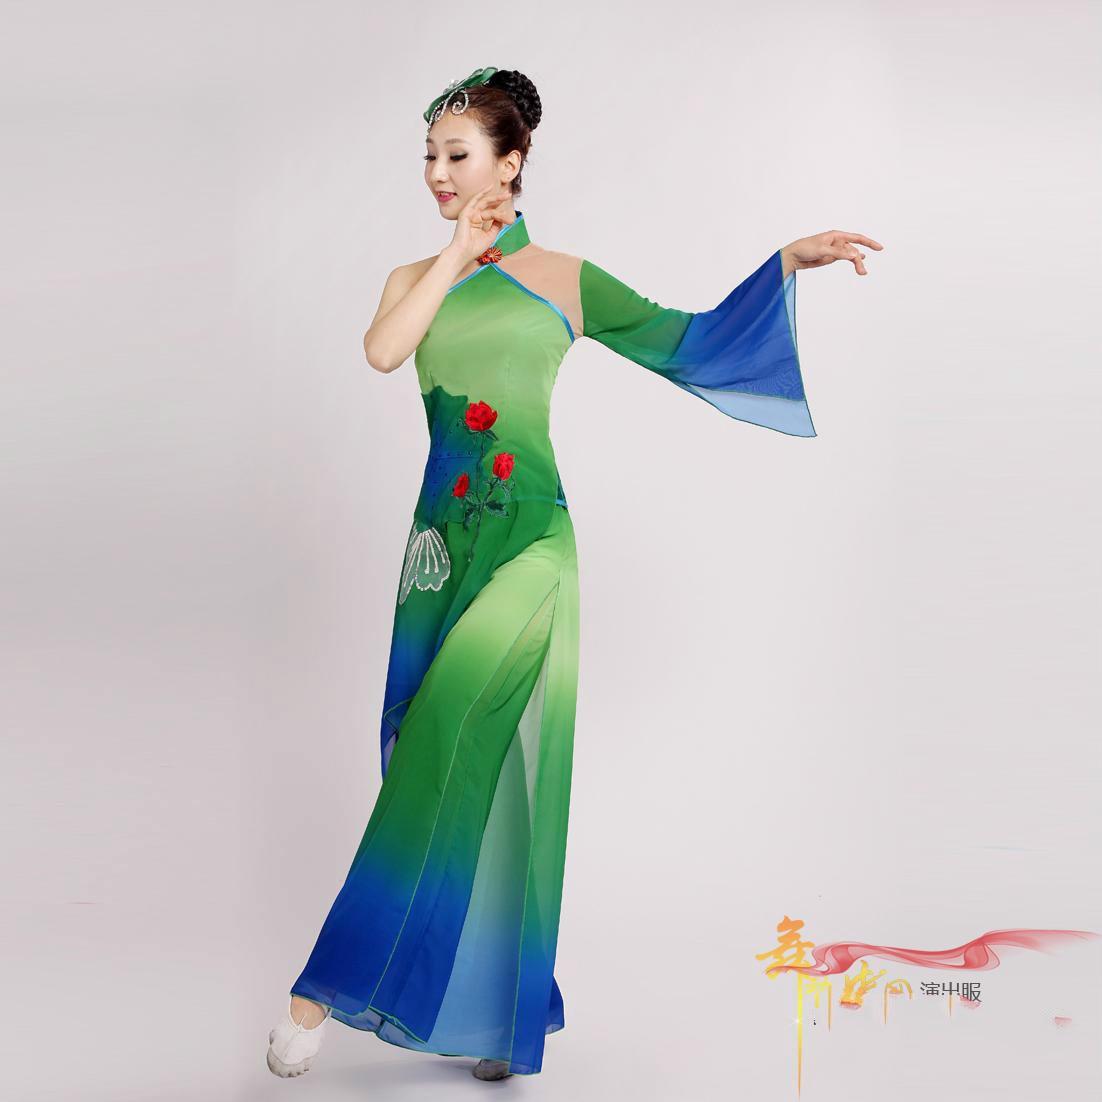 dress - How to classical wear dance dress video